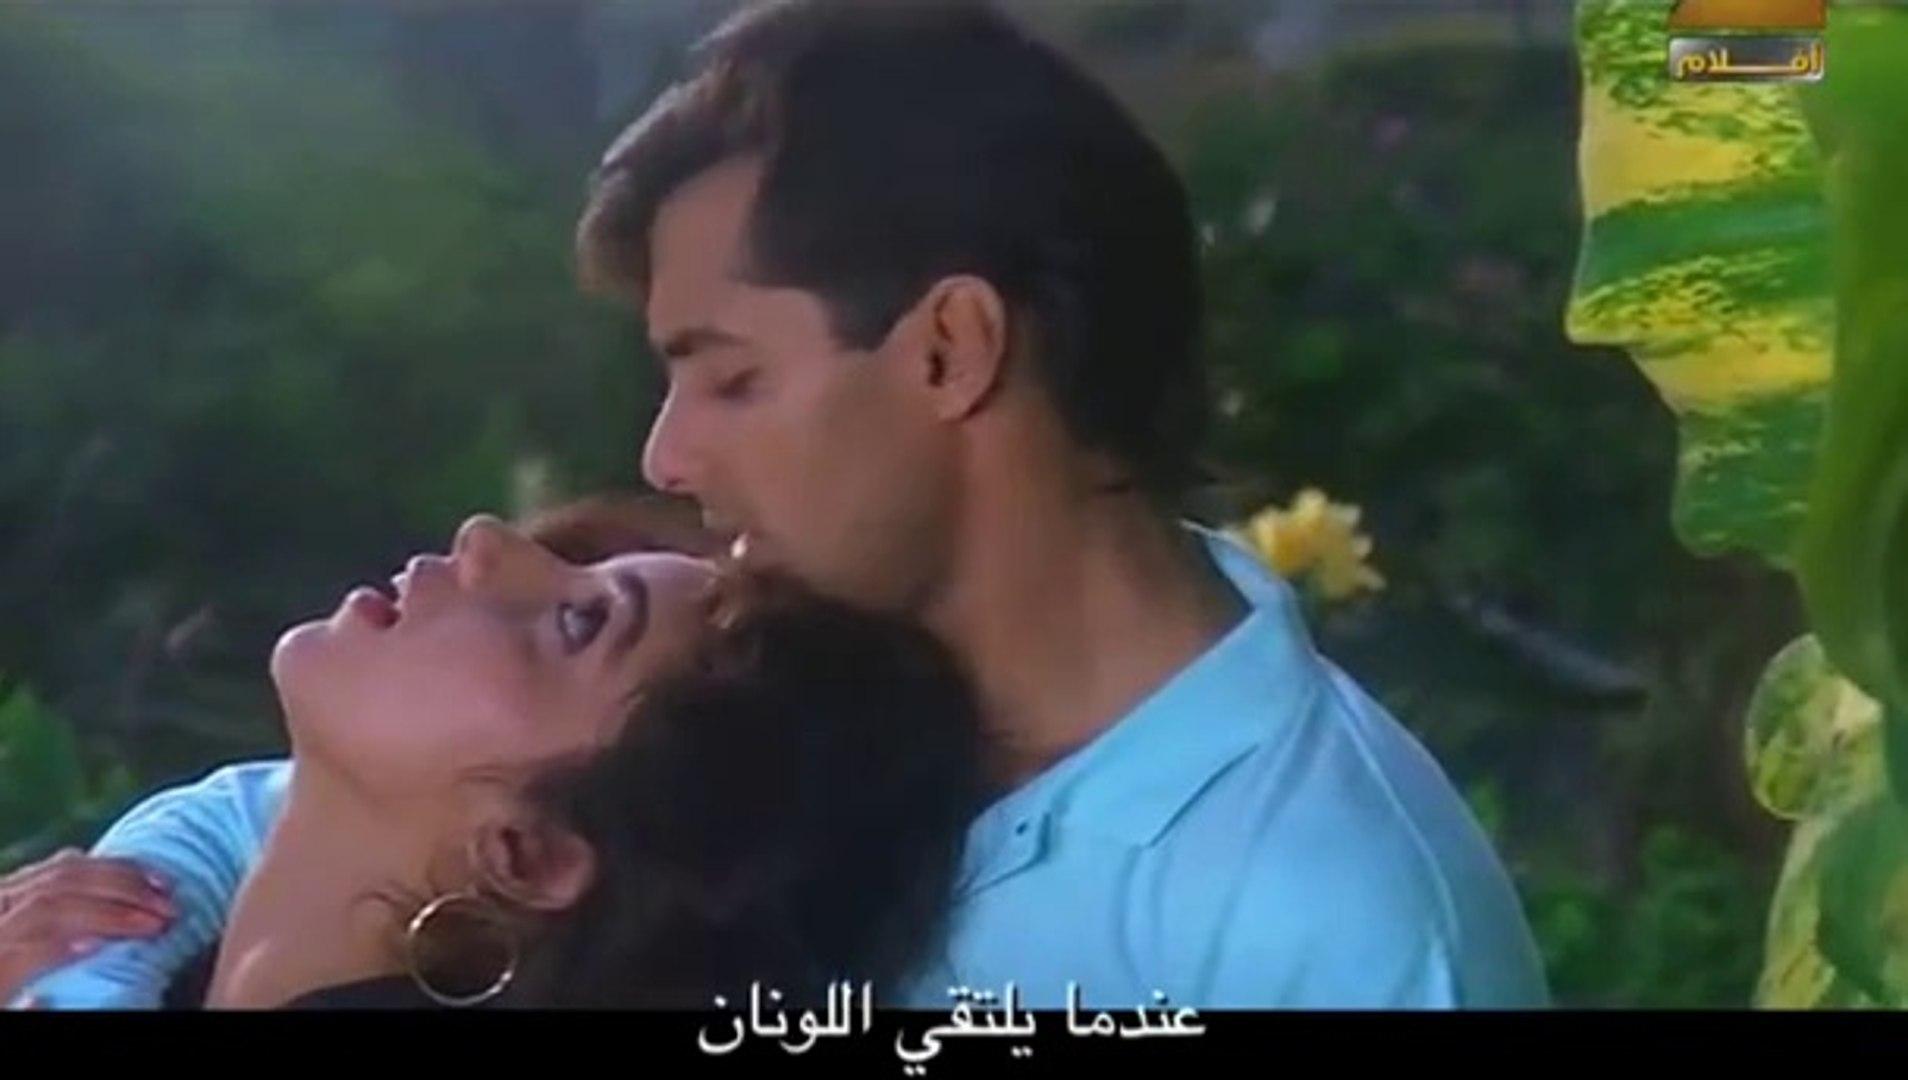 Saathiya Ye Tune Kya Kiya - Love , Salman Khan - video dailymotion